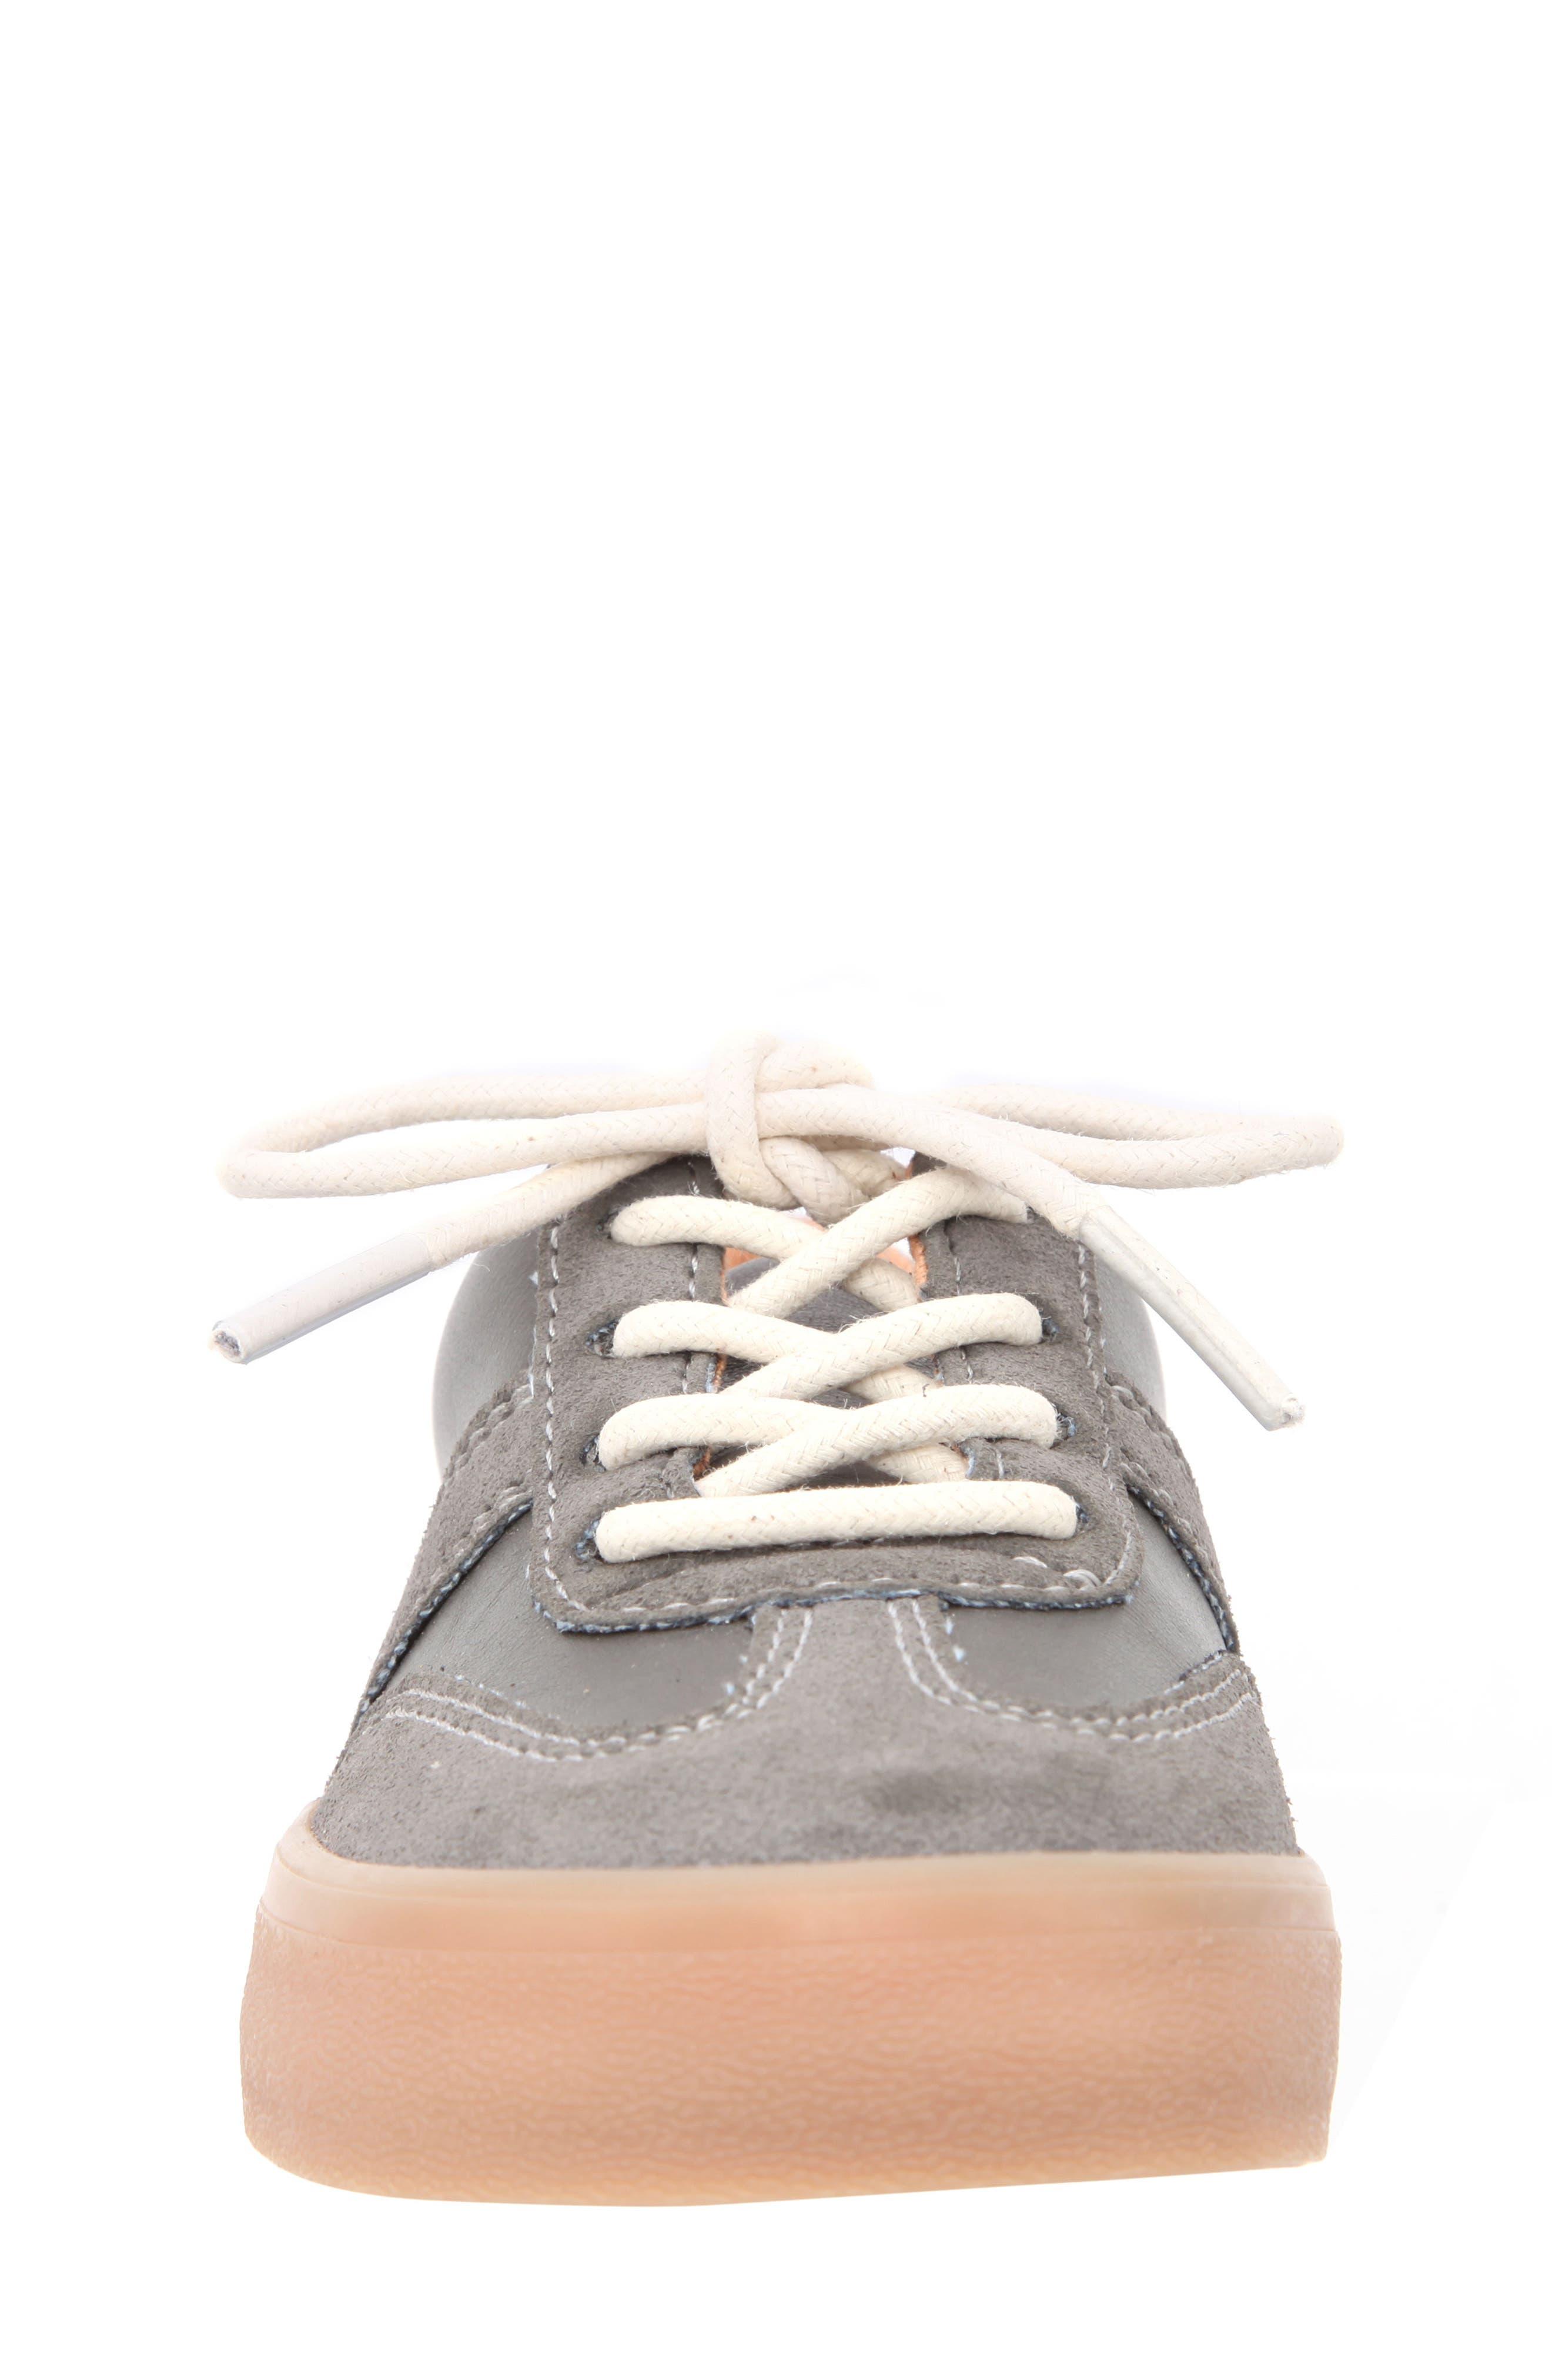 Neal Low Top Sneaker,                             Alternate thumbnail 4, color,                             Grey Suede